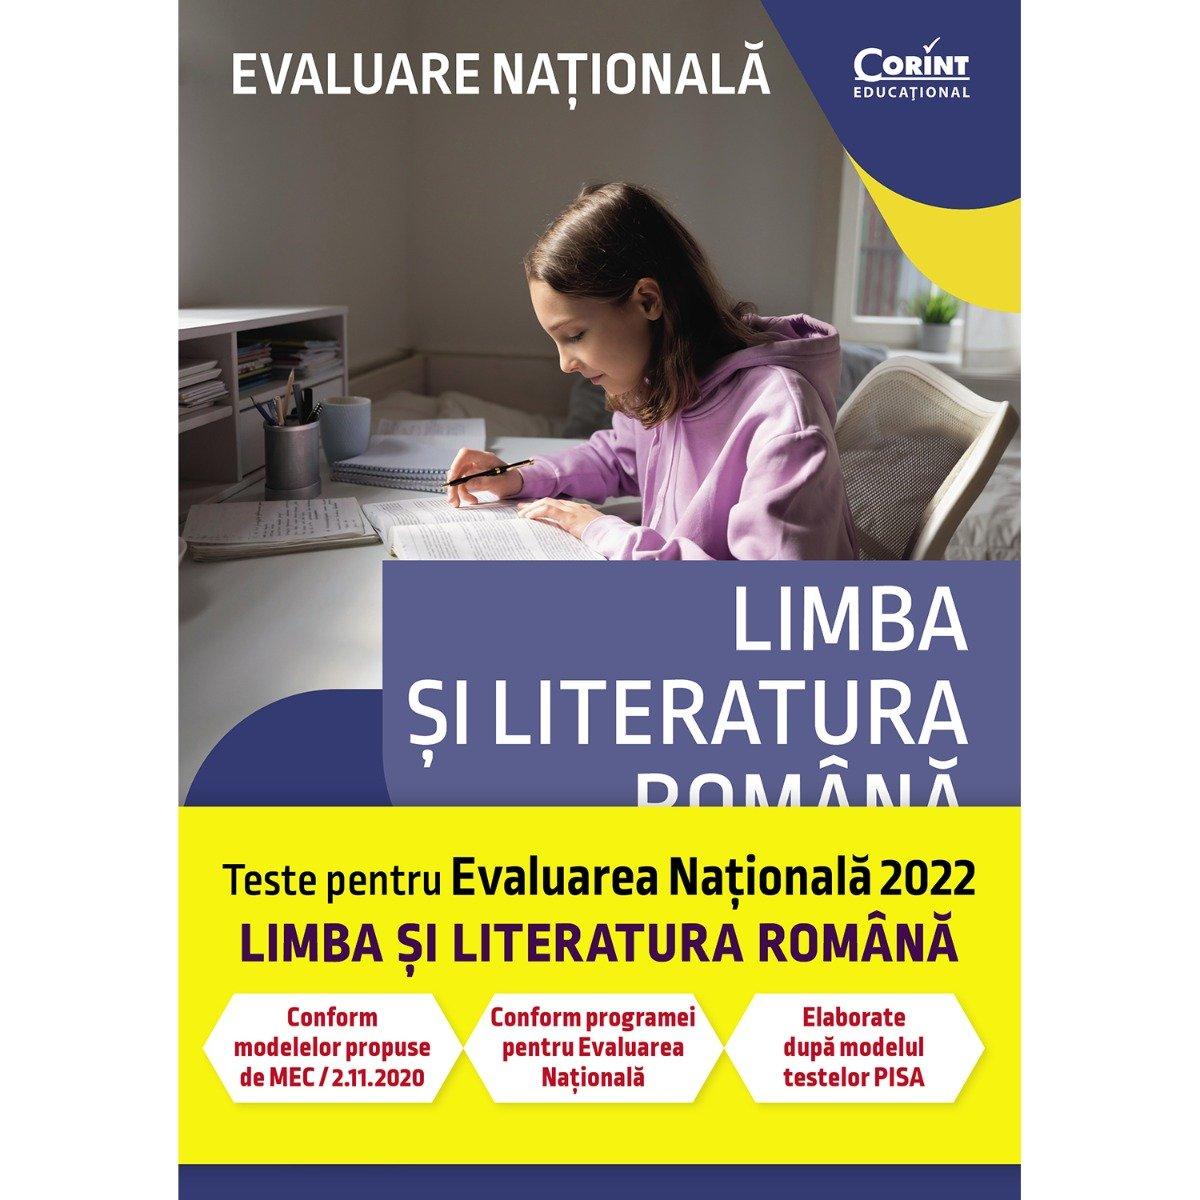 Evaluare nationala, Limba si literatura romana 2022, Andreea Nistor